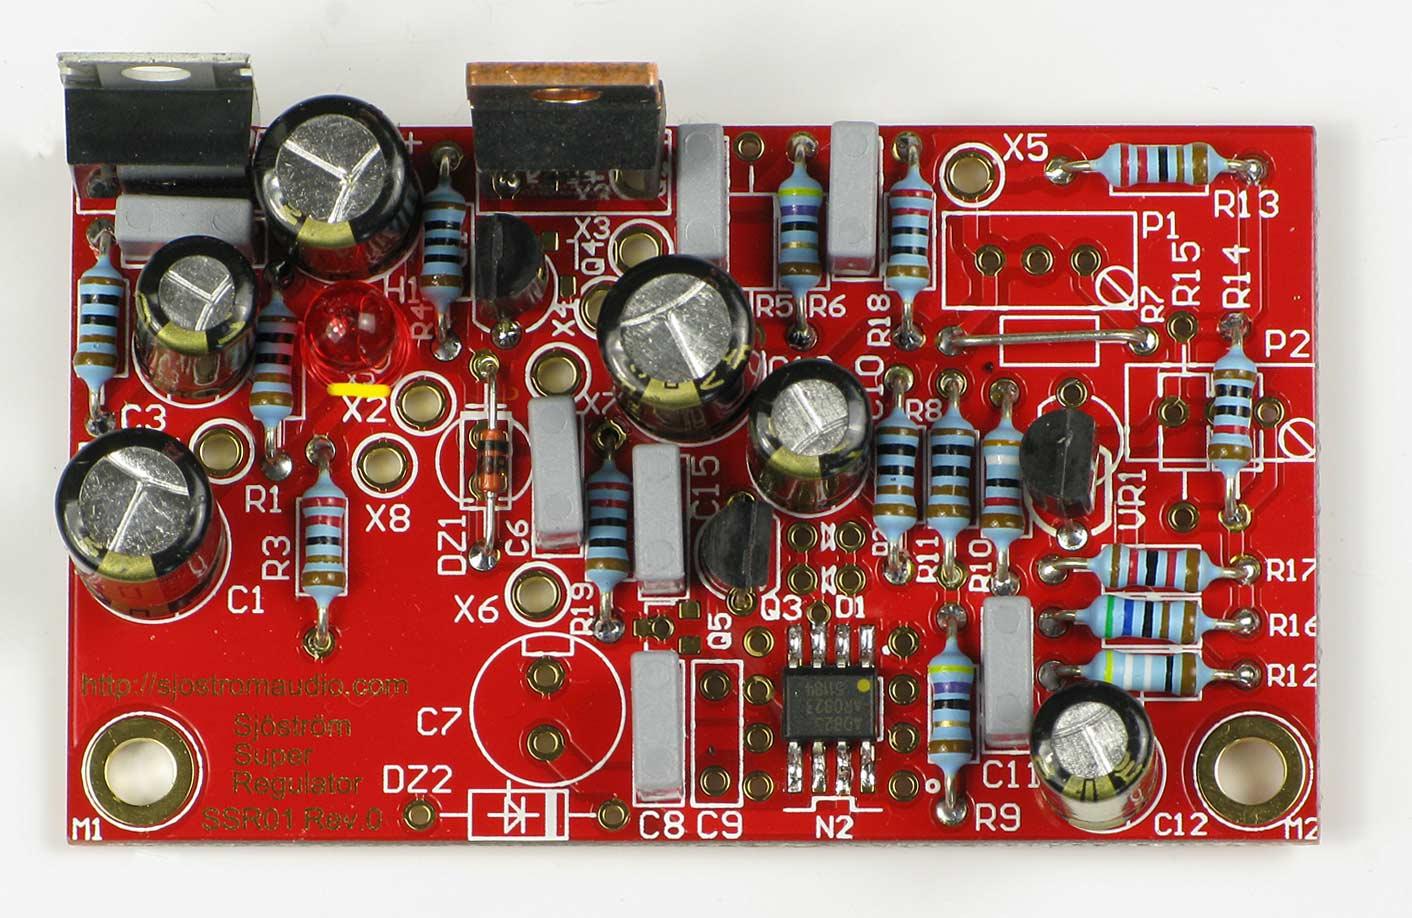 Sjstrm Audio Ssr01 Super Regulator Lm431 8 Pin Surface Mount Zener Shunt Circuit Schematic 18 V With